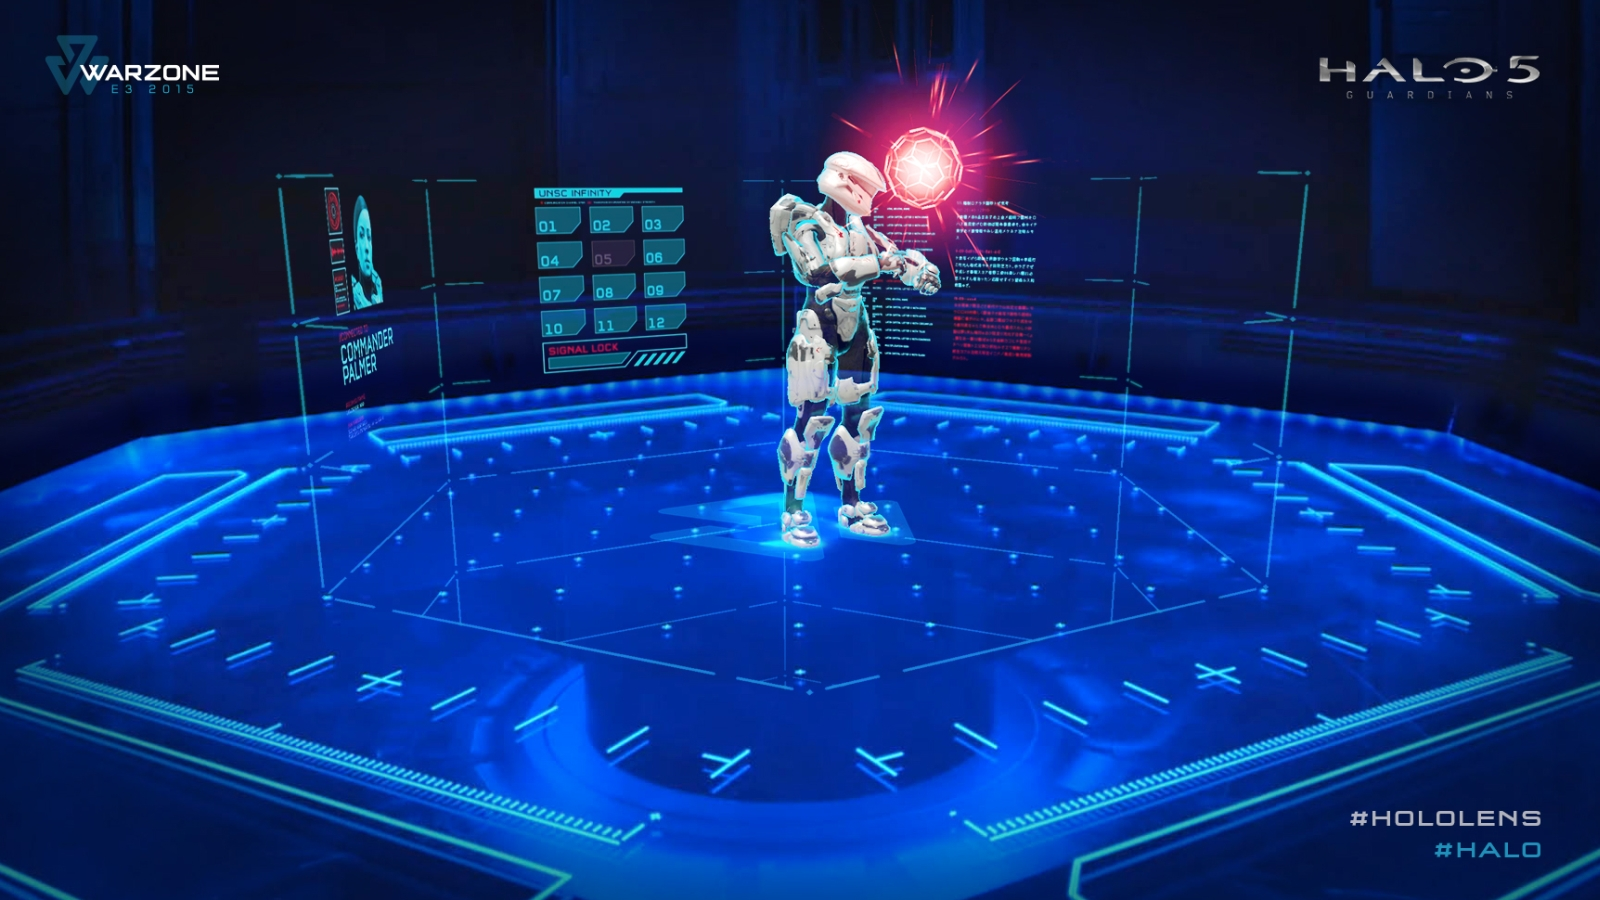 HoloLens Halo Warzone E3 2015 demo